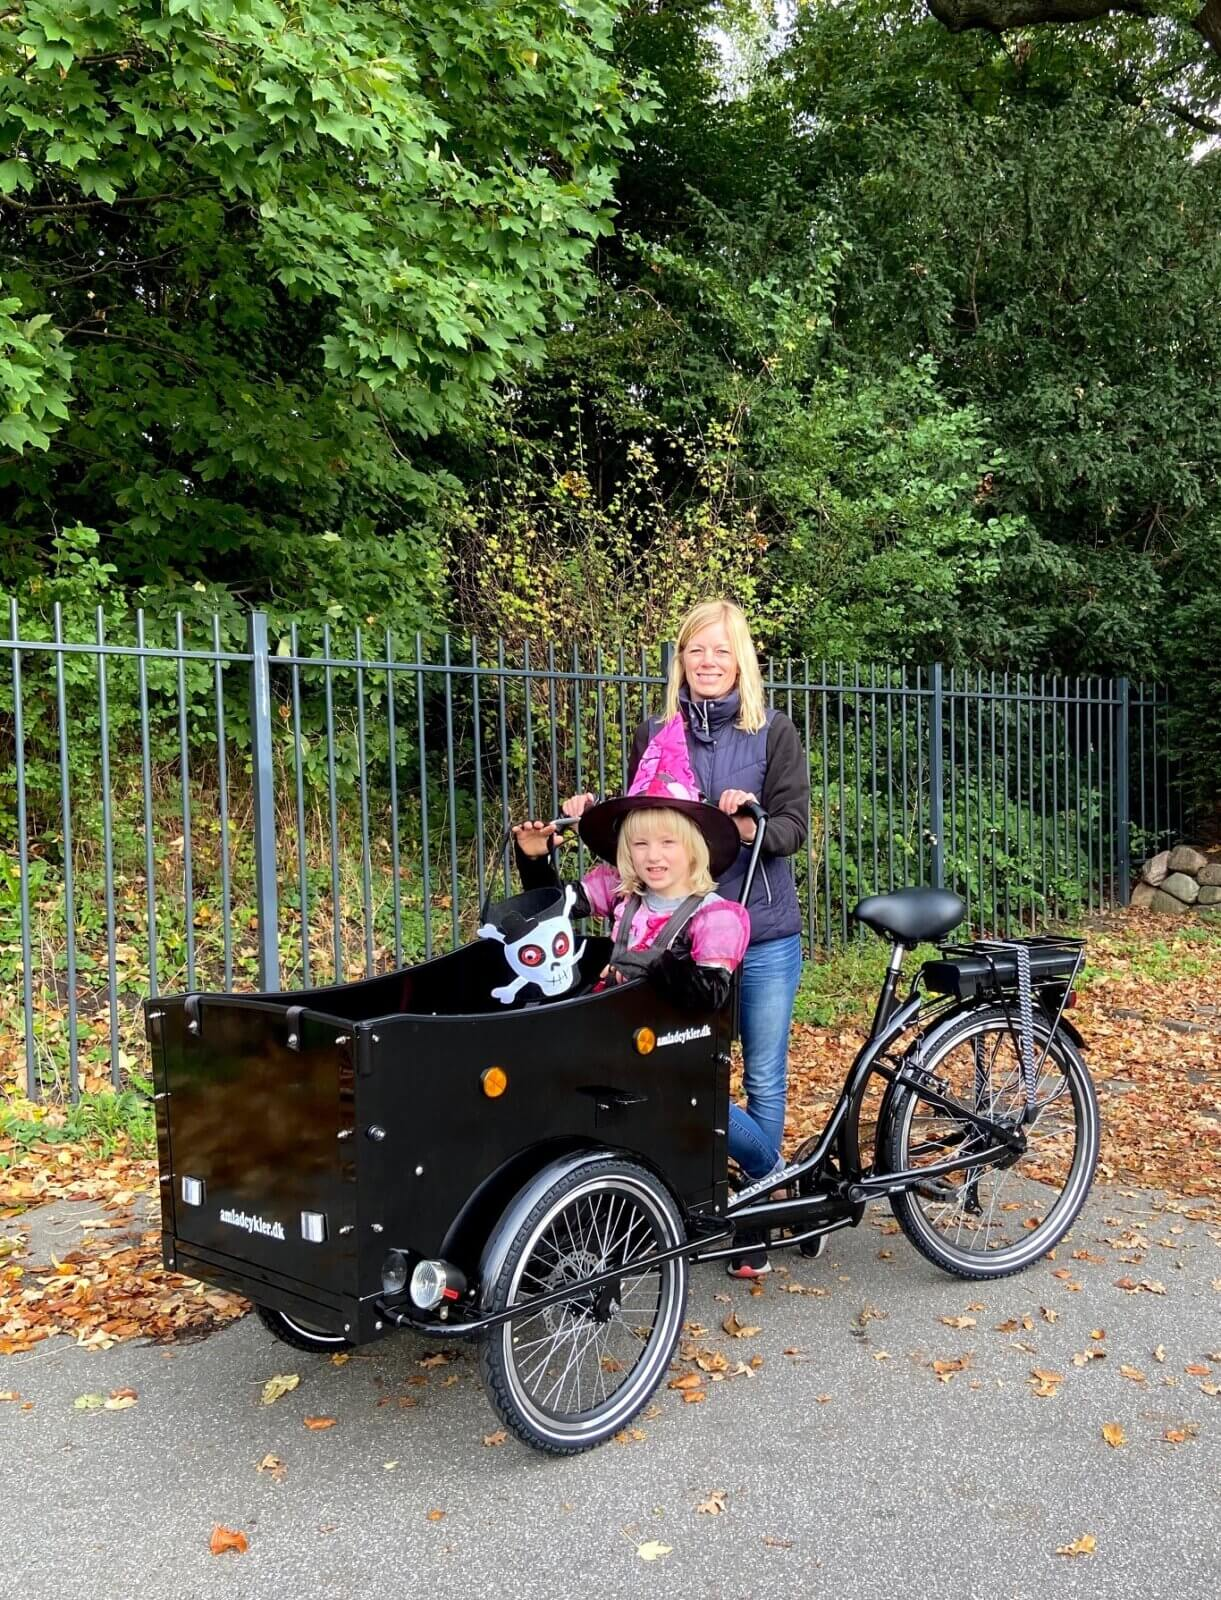 Efterårsferie med cykel - ladcykel